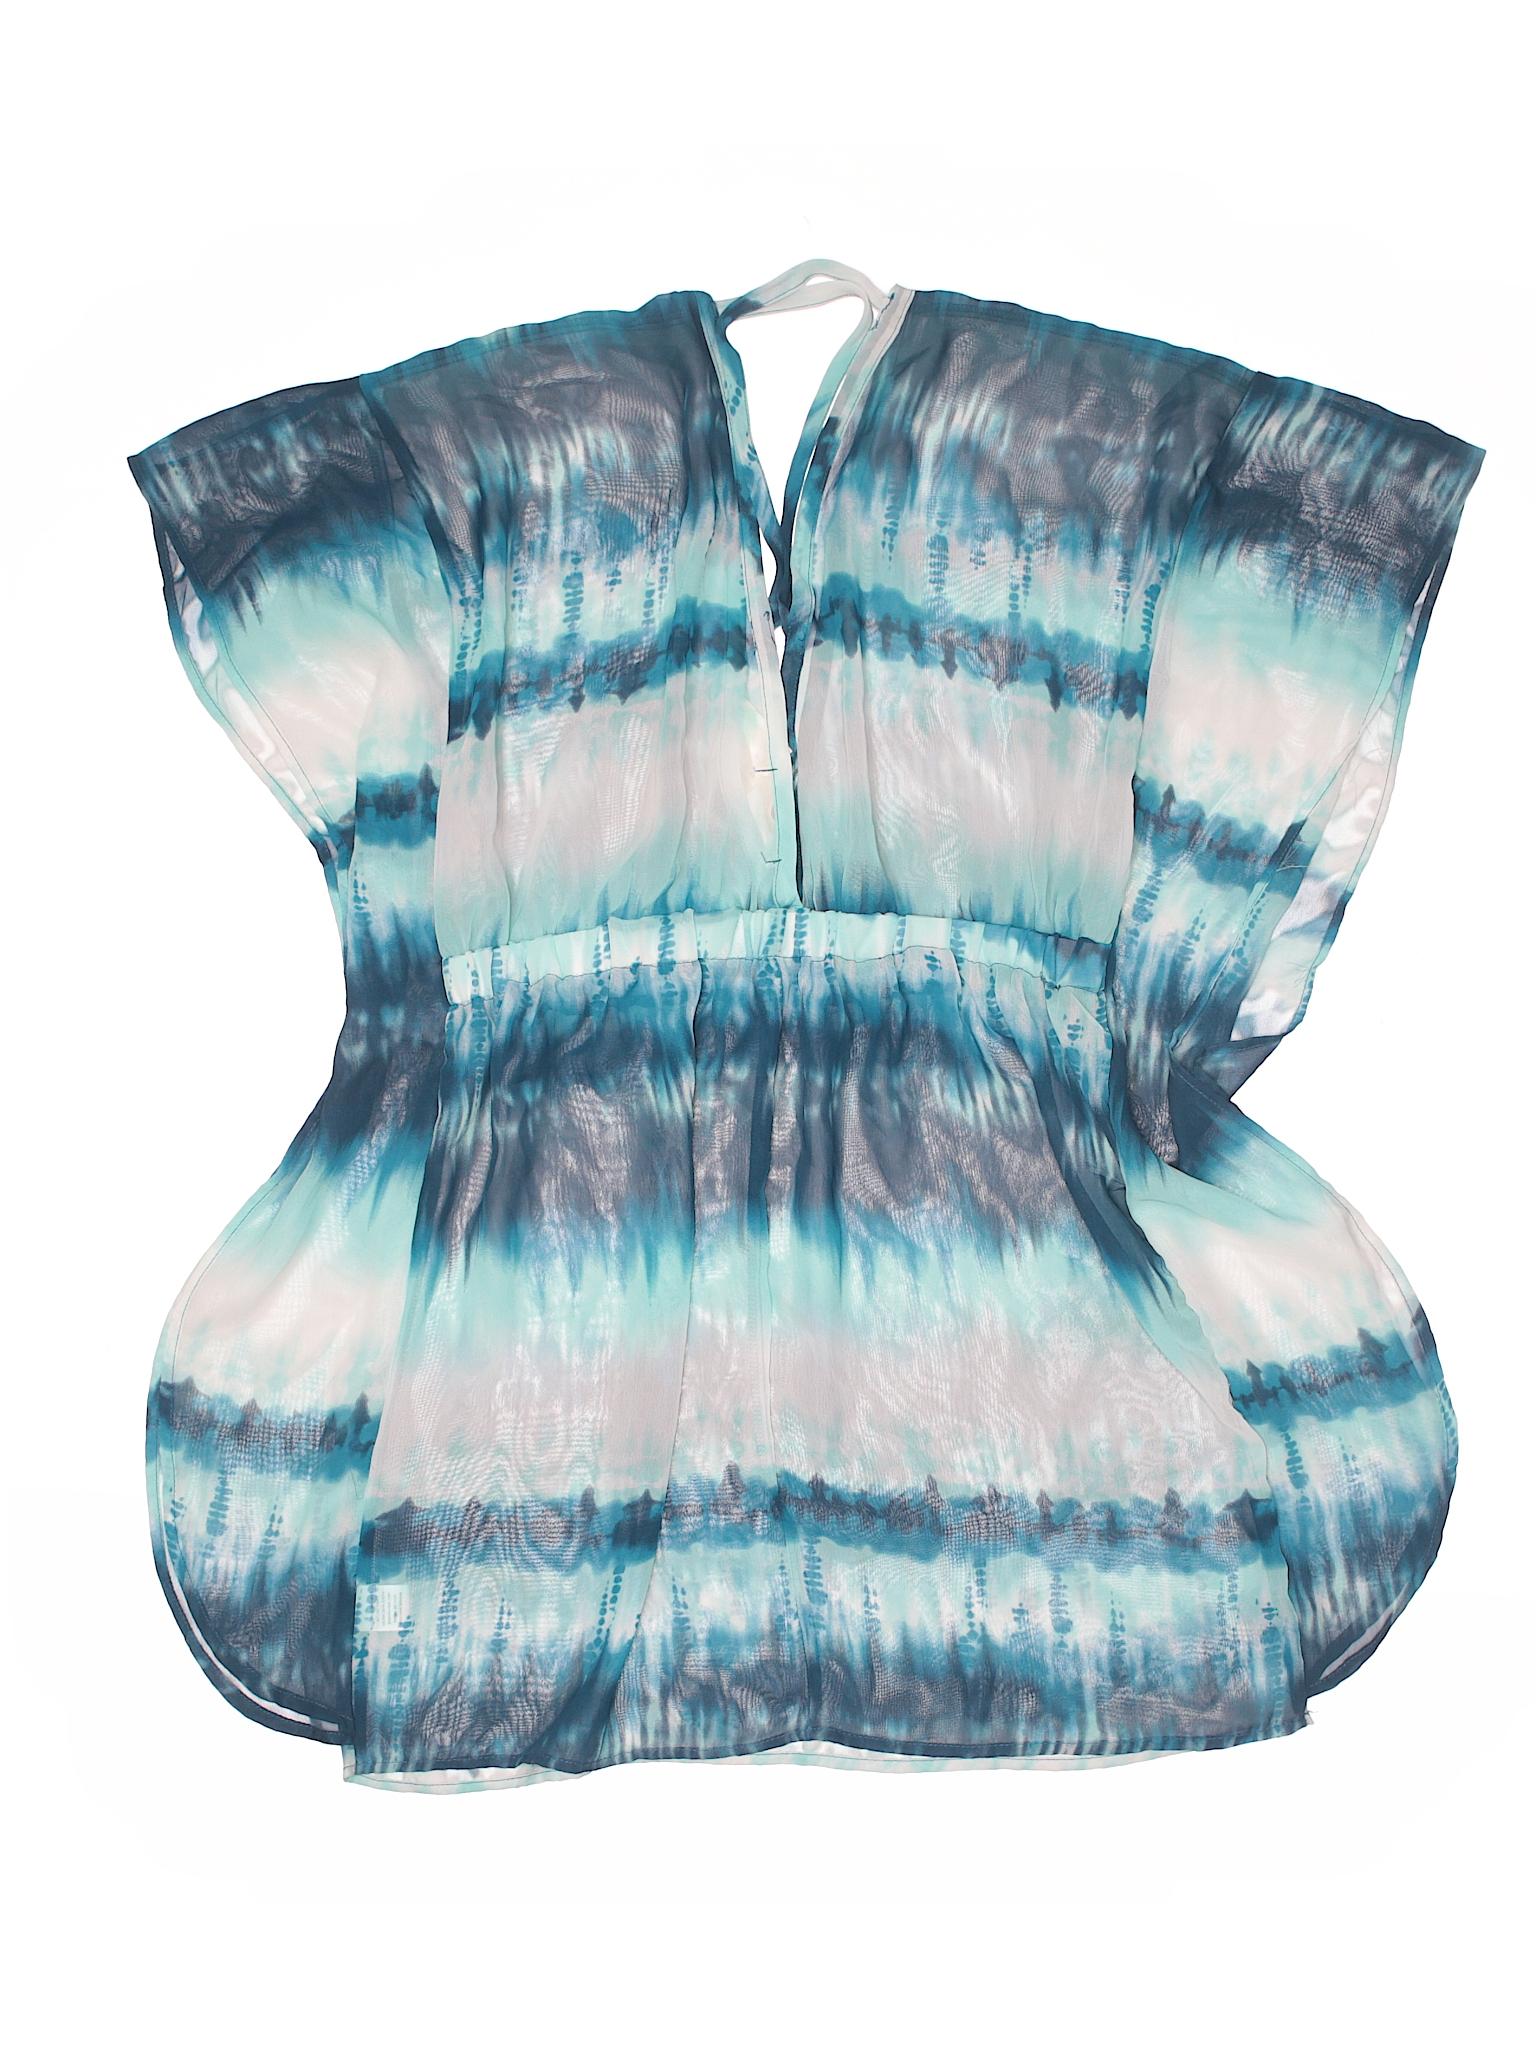 Miken F6rcvqCepi Cover Up Boutique Swimsuit Clothing z0xfcqd